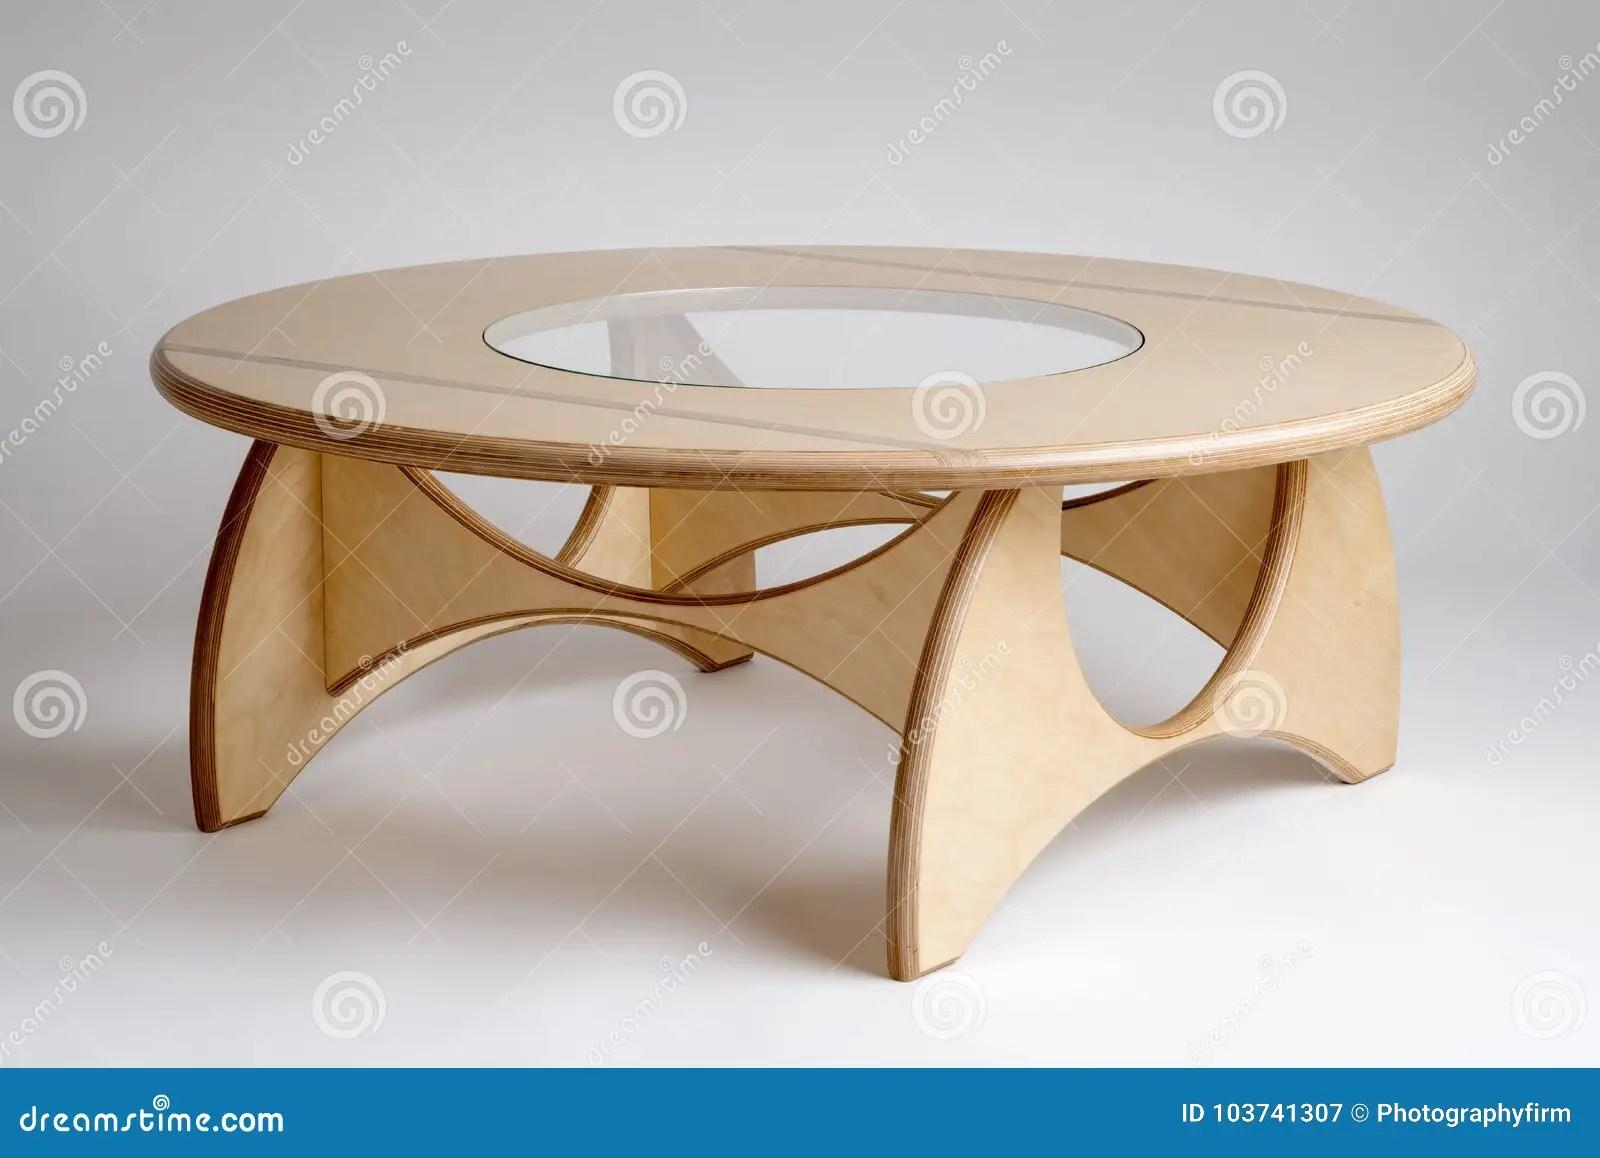 https www dreamstime com bare wood designer circular low table glass center bare wood designer round low table see glass center image103741307